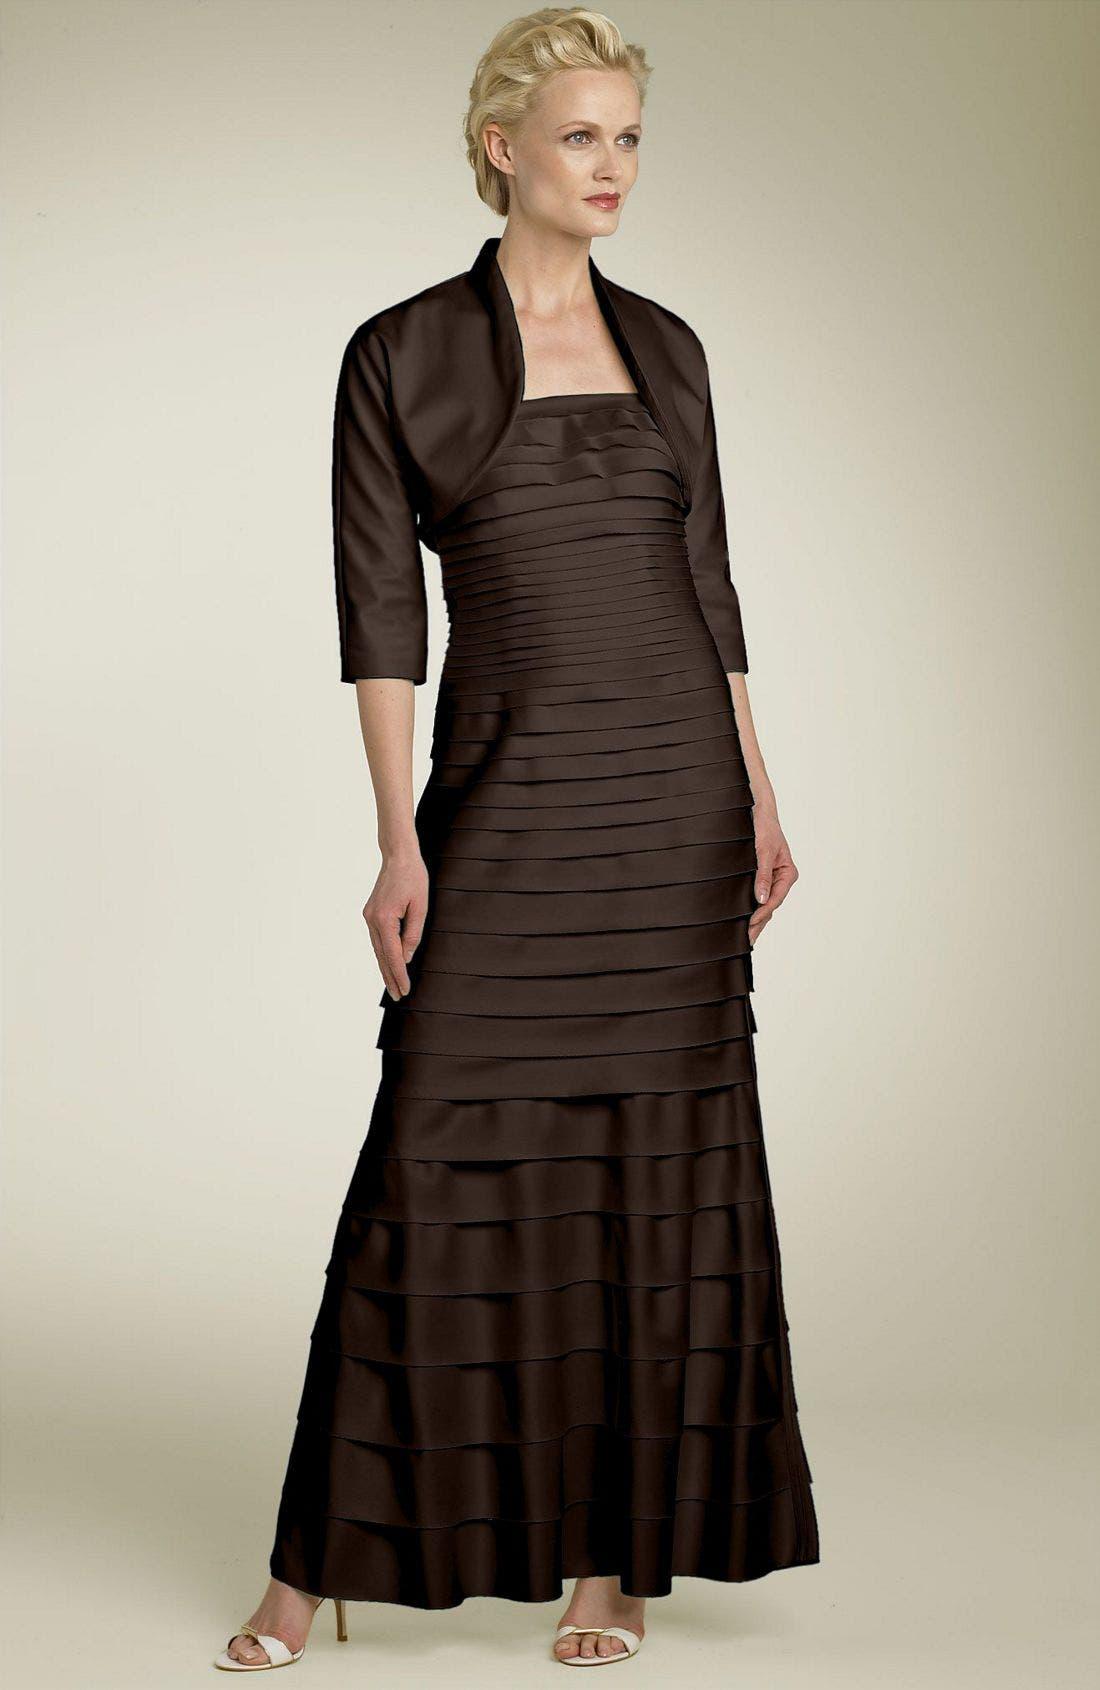 Alternate Image 1 Selected - JS Collections Laser Cut Dress & Bolero